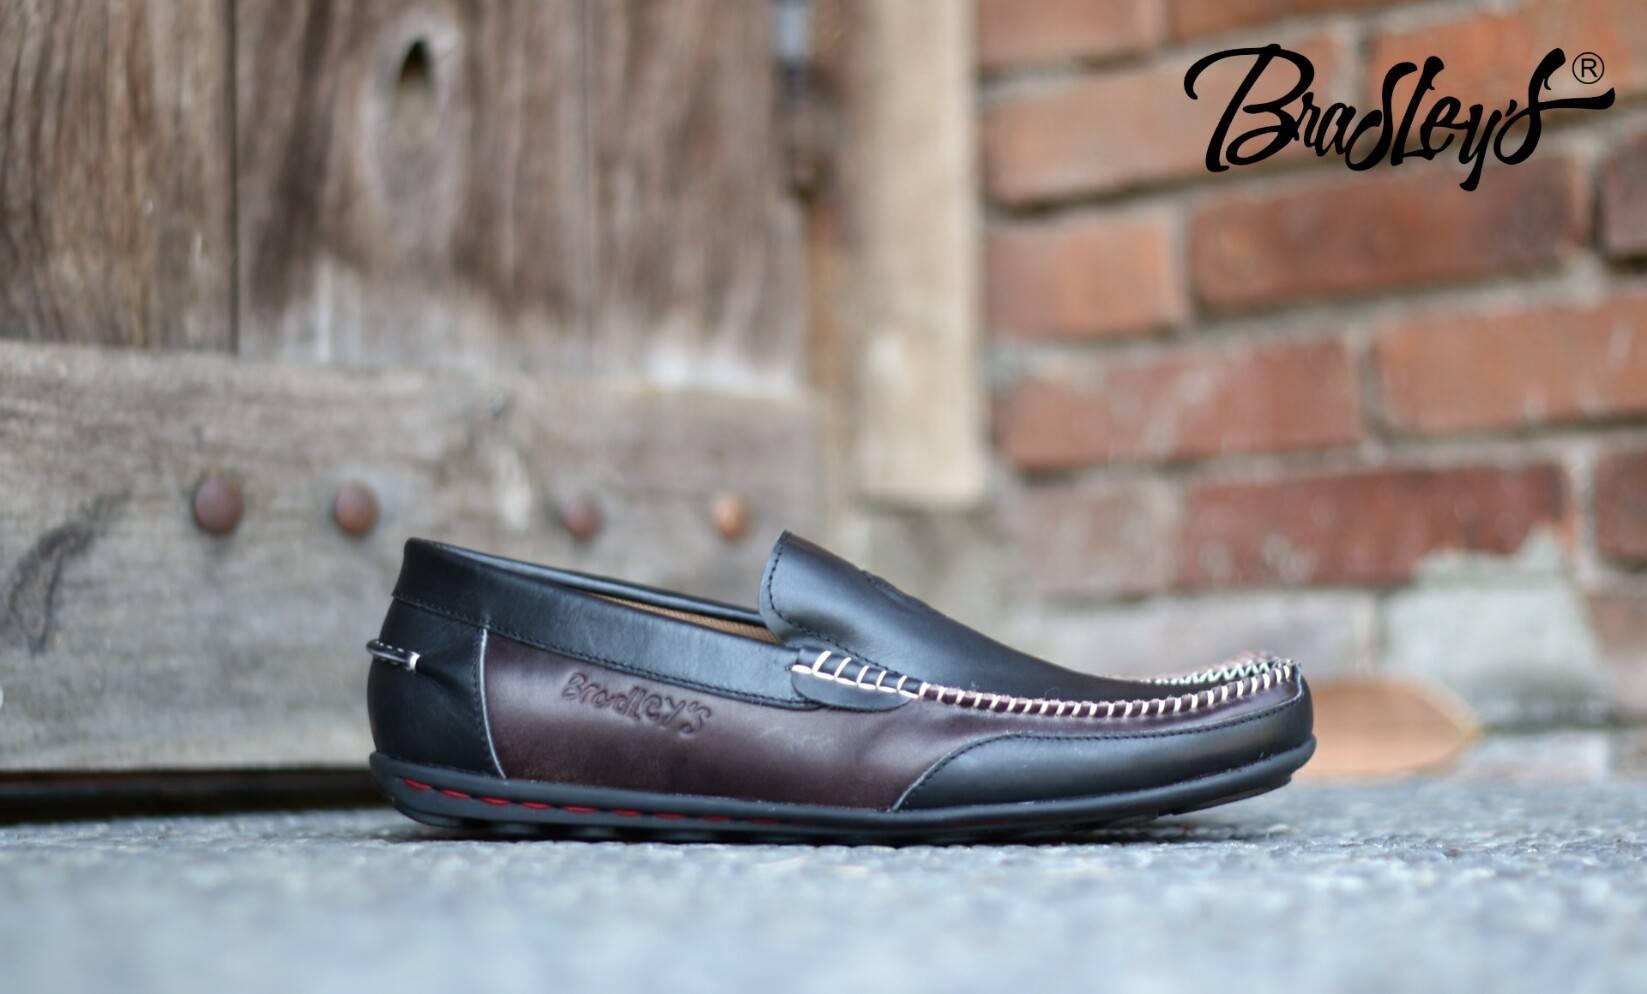 Sepatu Kulit Gaul Info Harga Boot Bradley Erol Pria Slip On Asli Terbaru Santai Bradleys Moscato Hitam Coklat